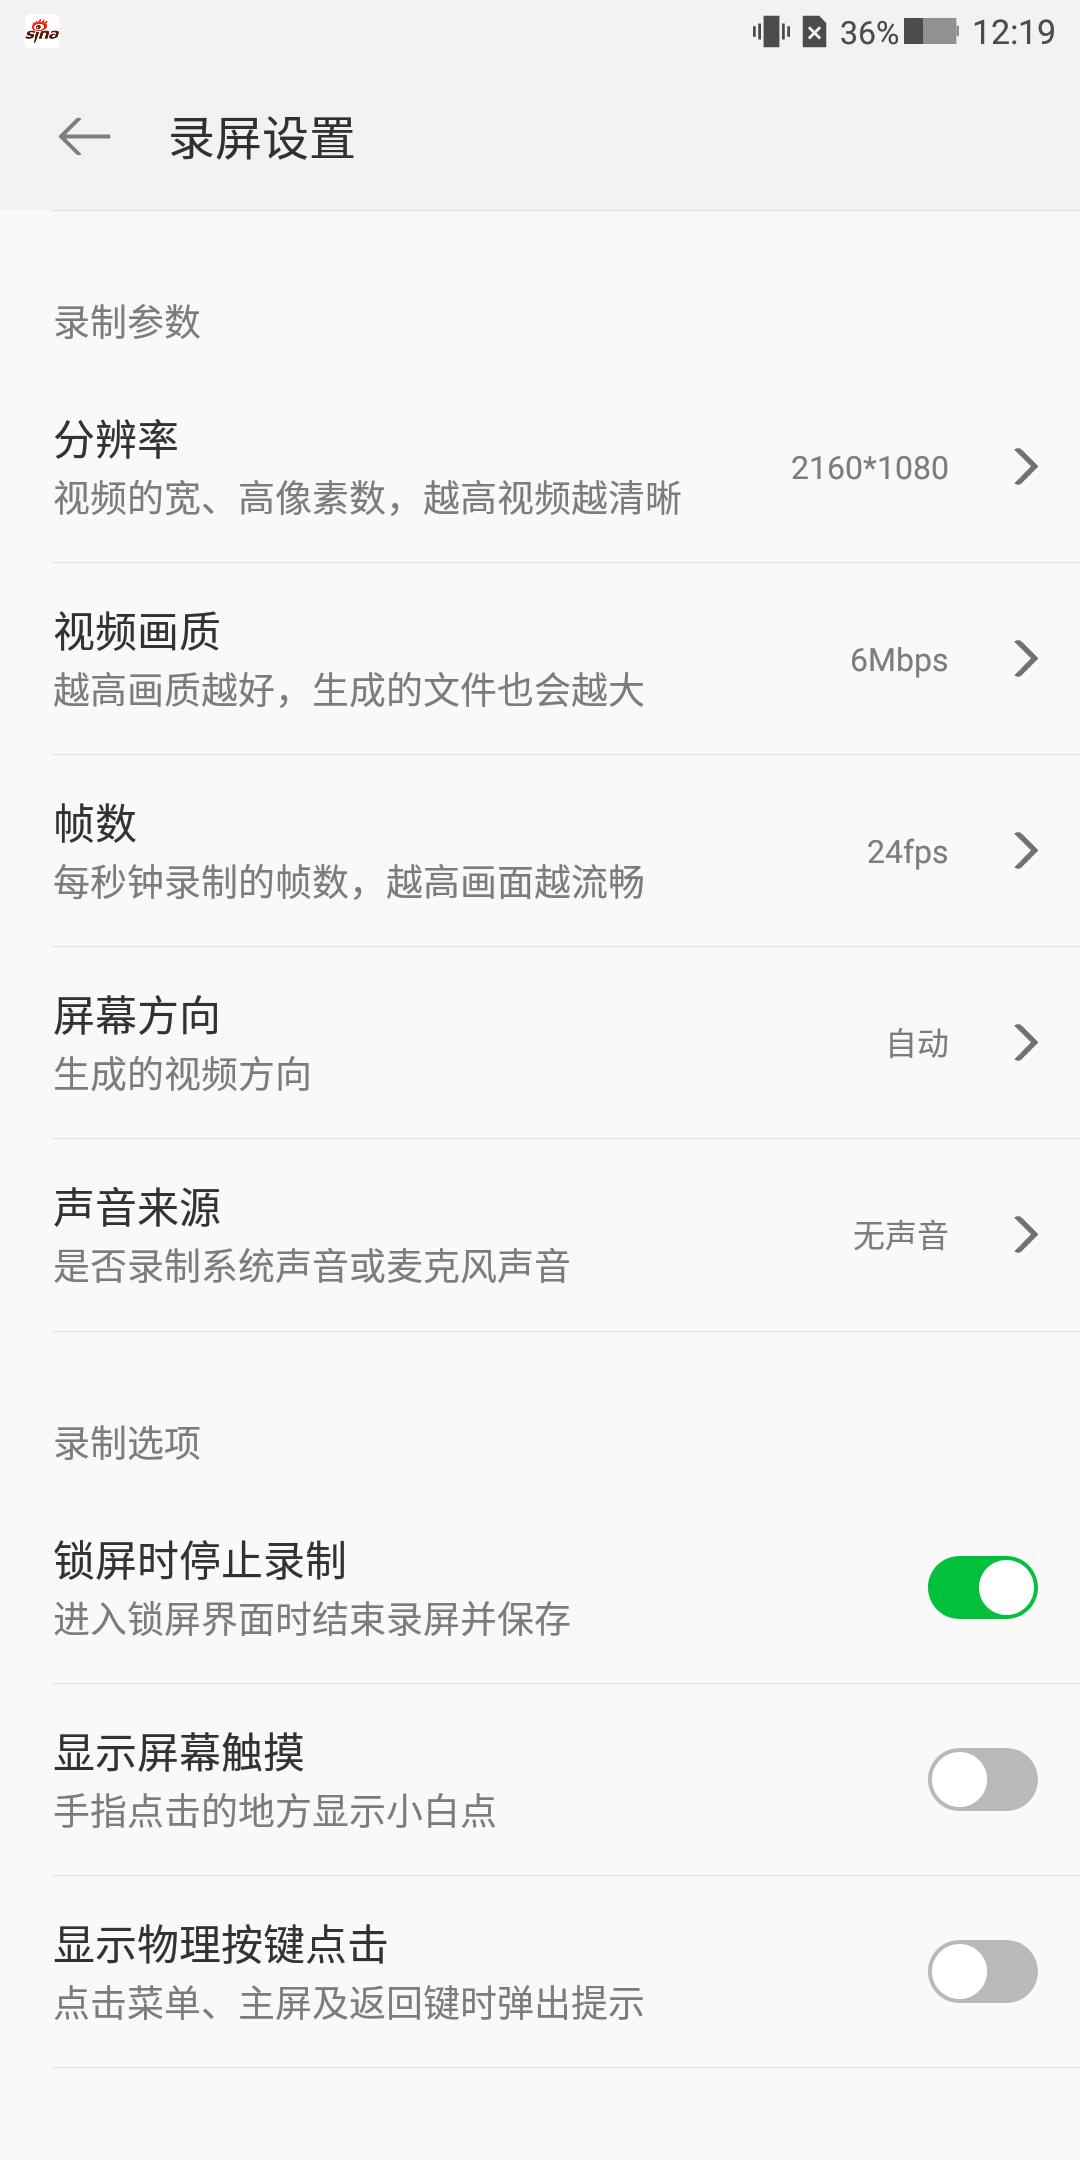 Screenshot_2018-04-27-12-19-51-987_com.blackshark.png